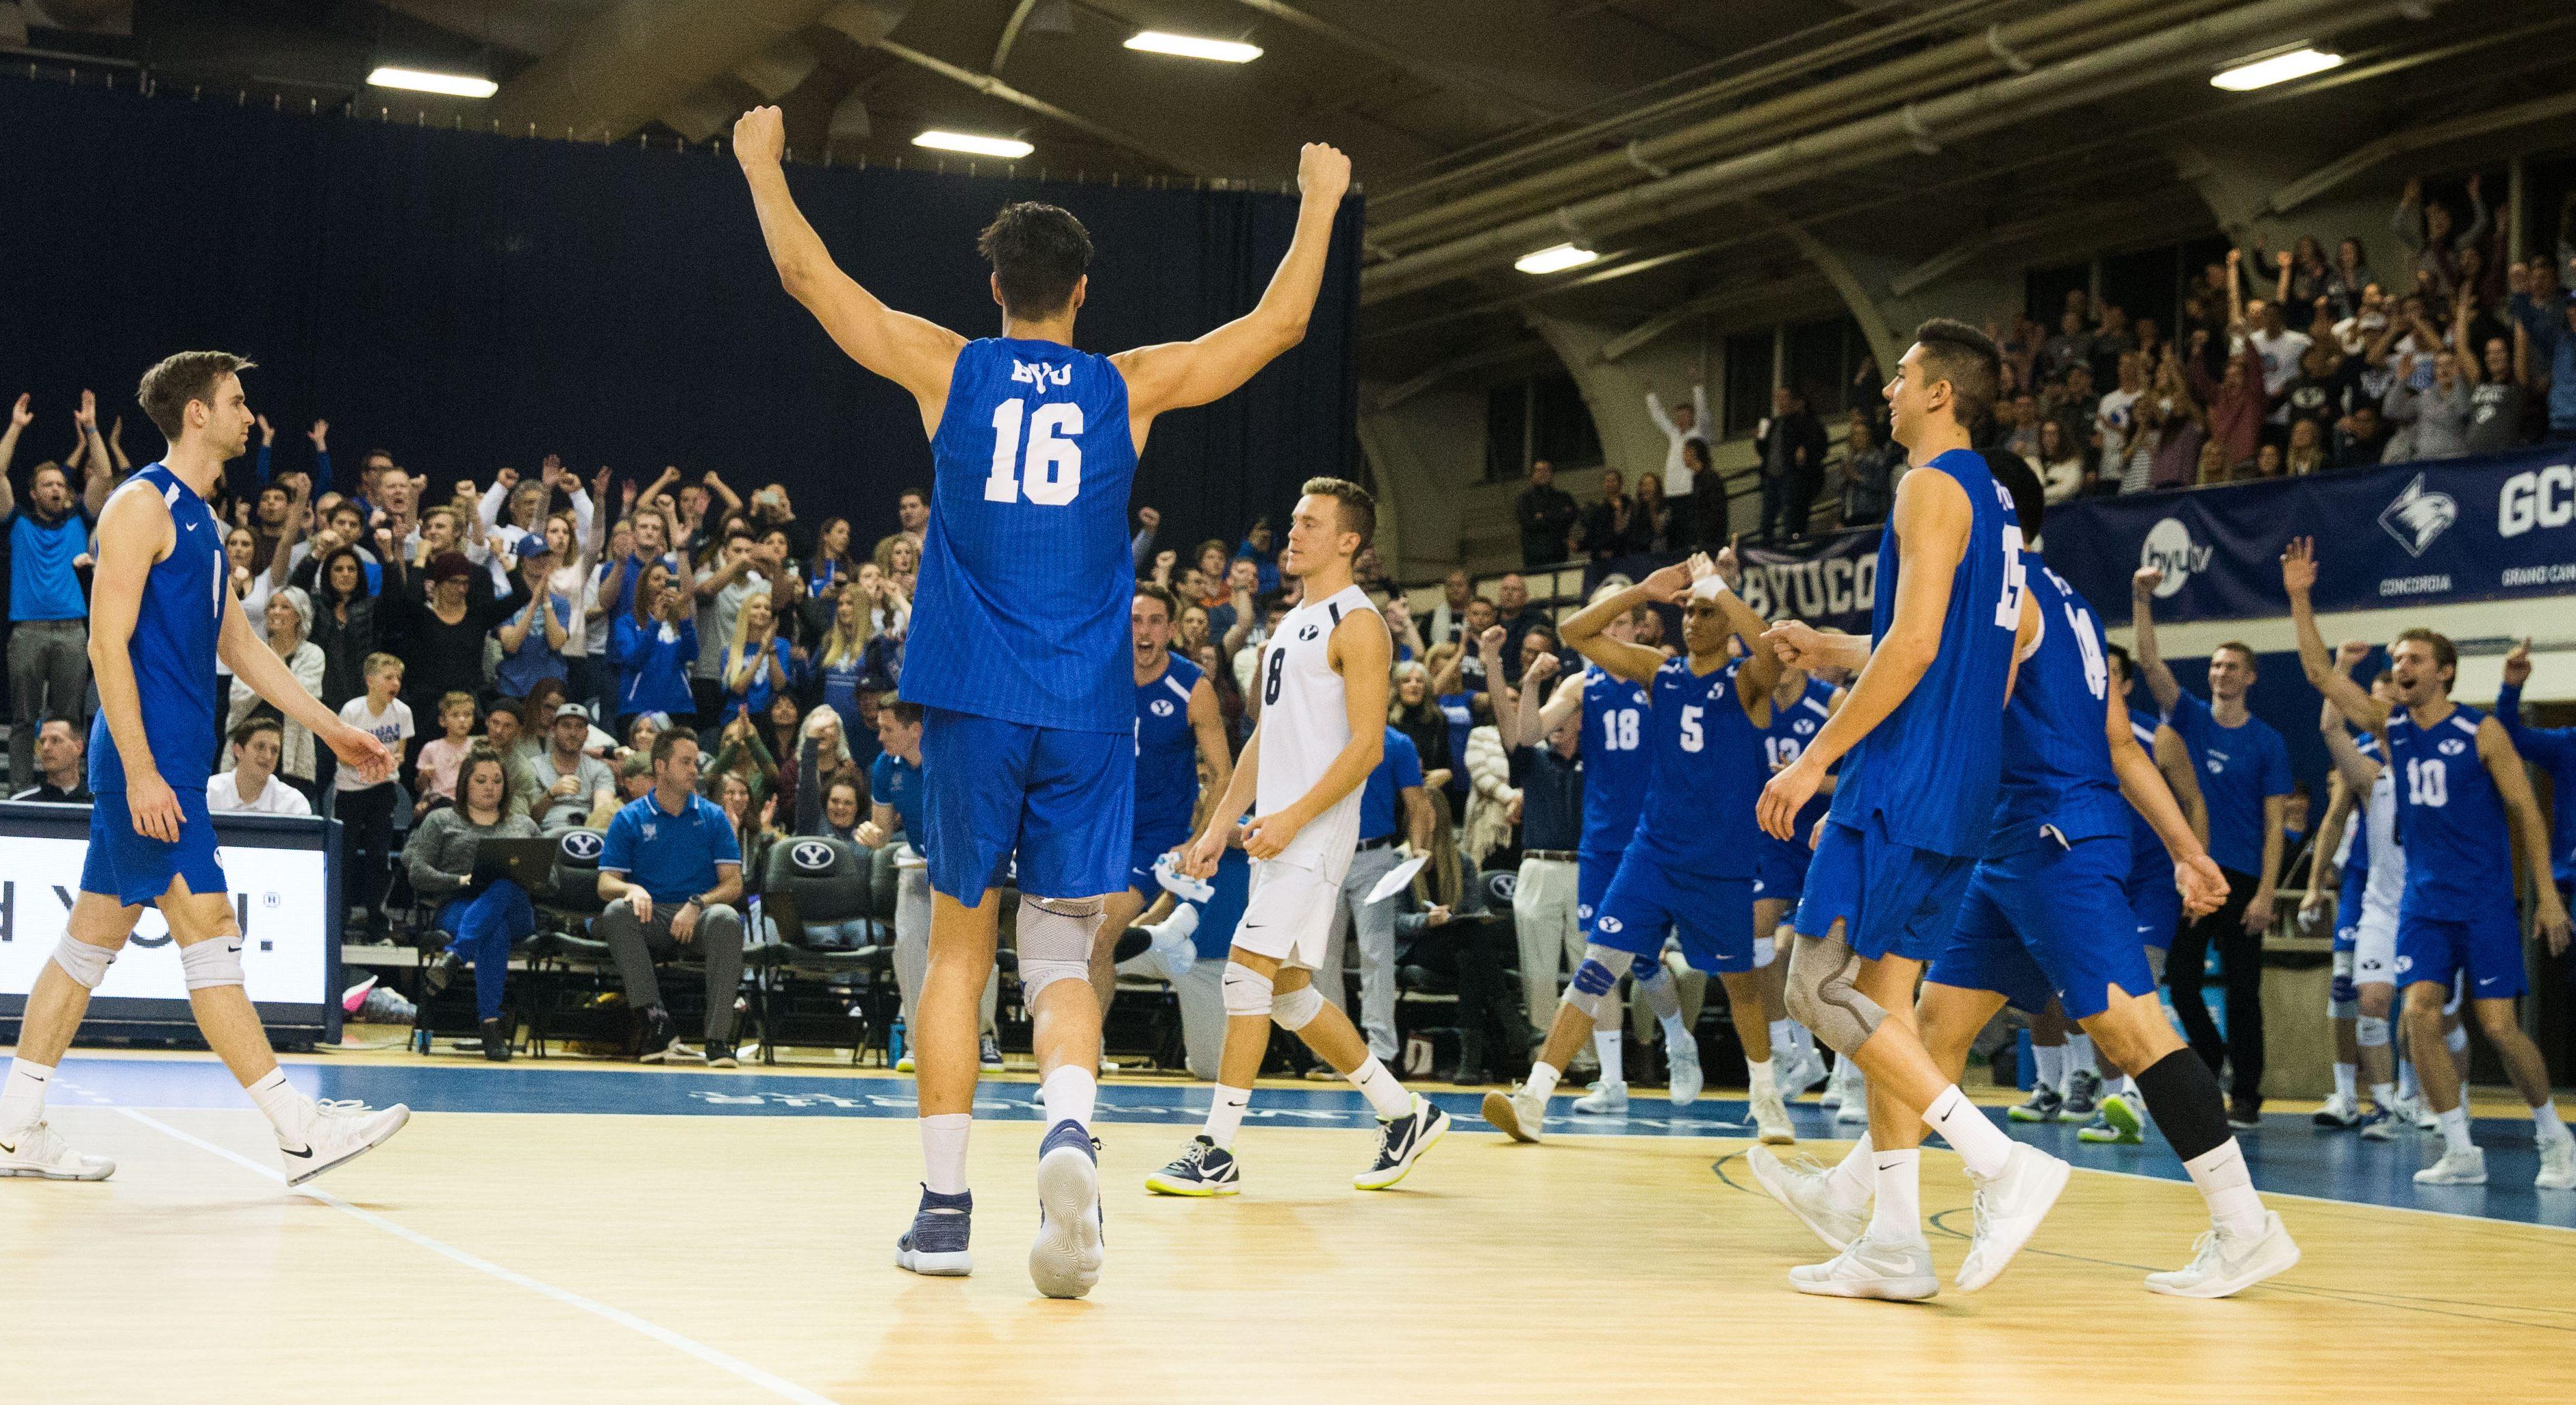 BYU men's volleyball wins thirteenth-straight over USC